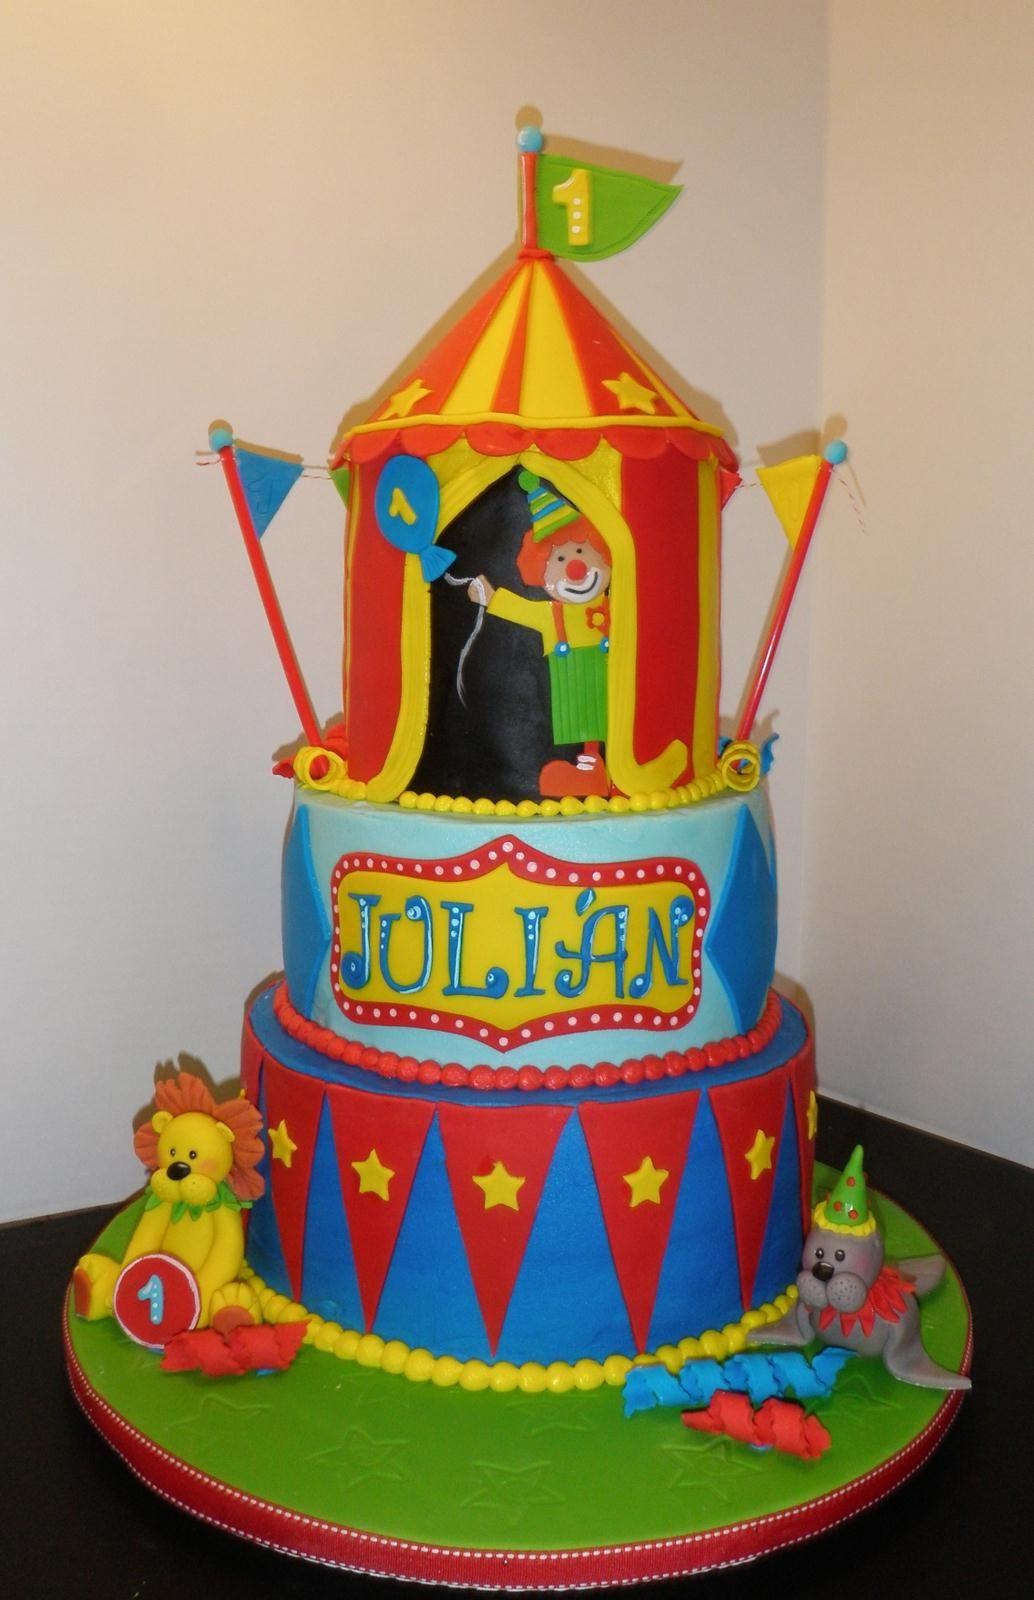 A fun circus themed first birthday cake